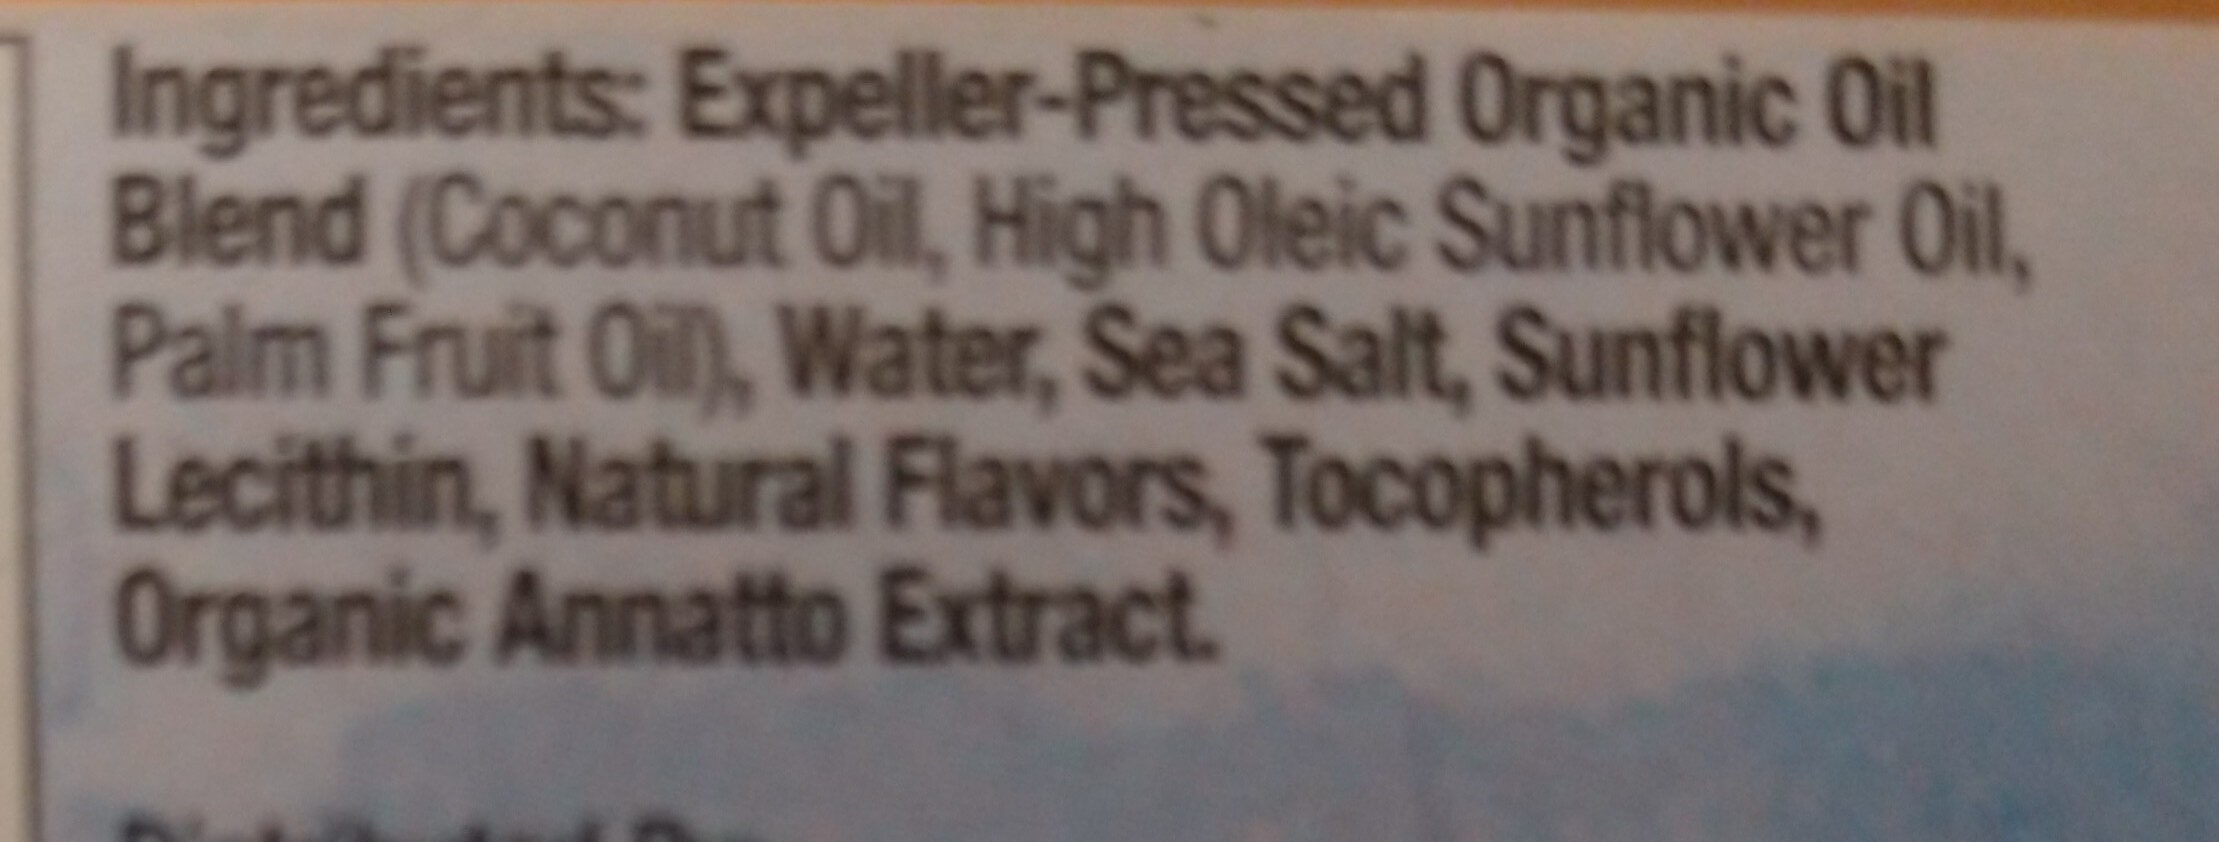 Organic Plant Based Buttery Spread Stick - Ingredients - en